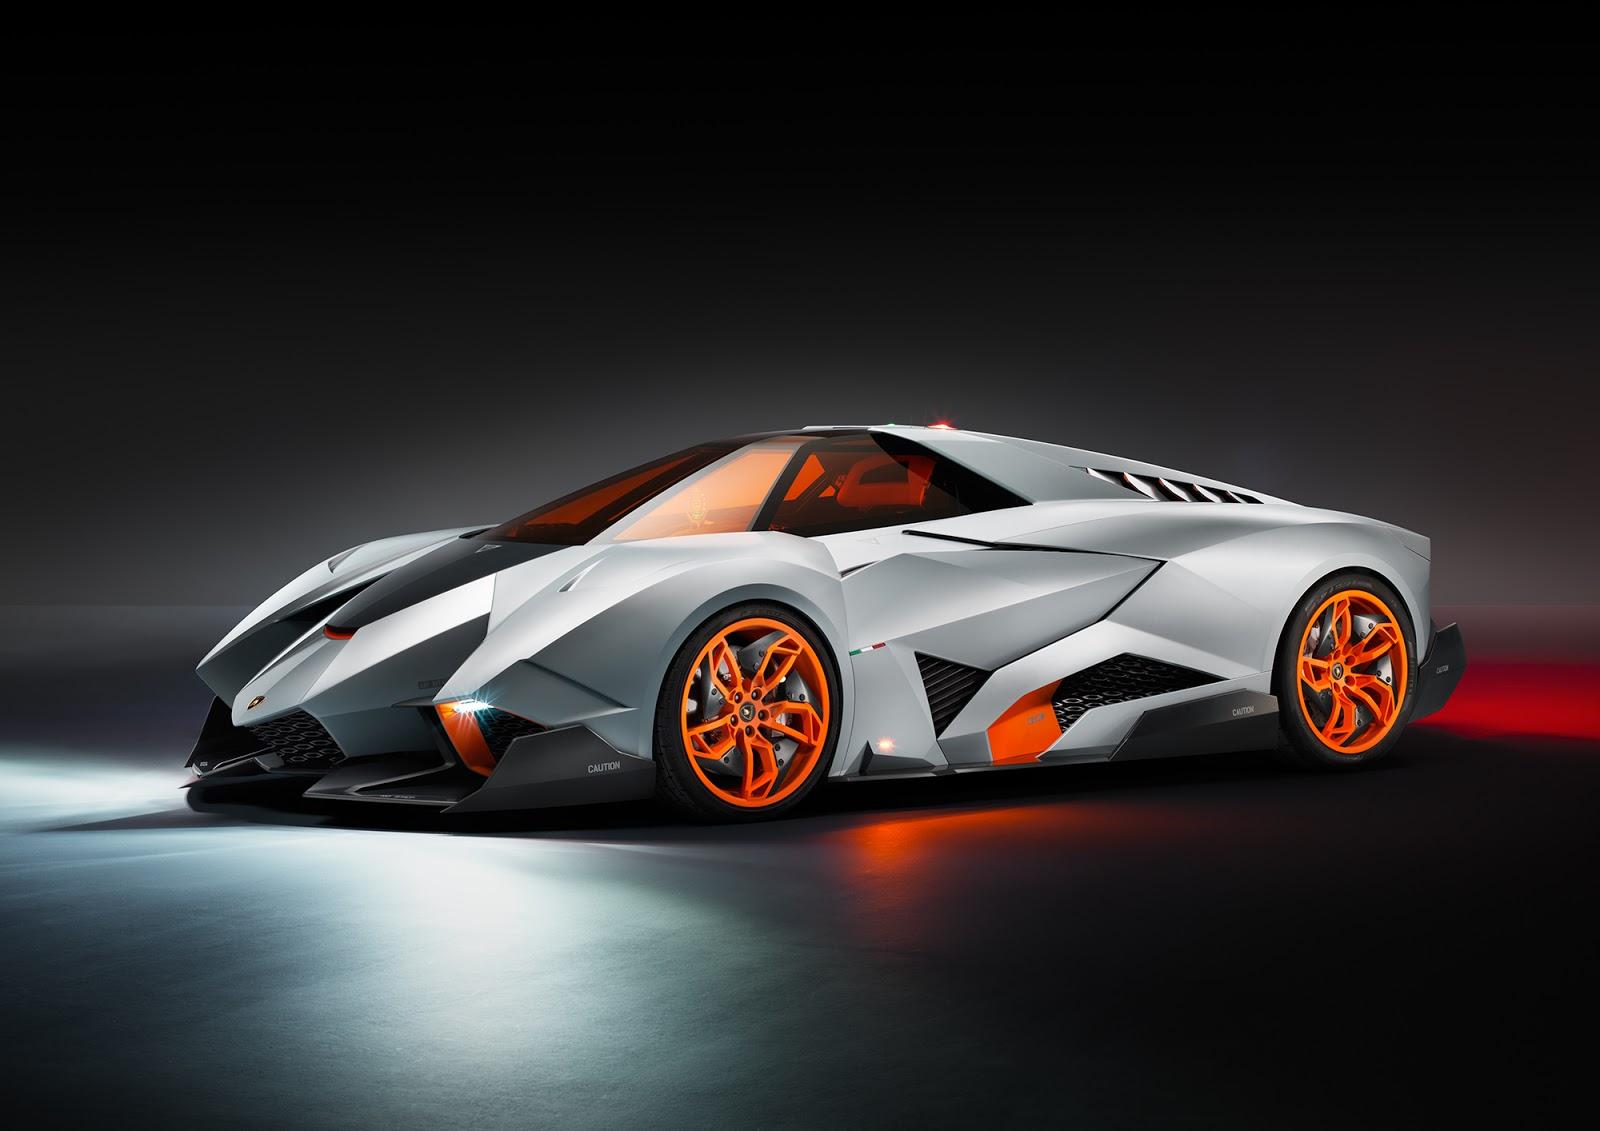 SPORTS CARS Lamborghini Egoista HD Wallpapers 1080p 1600x1131